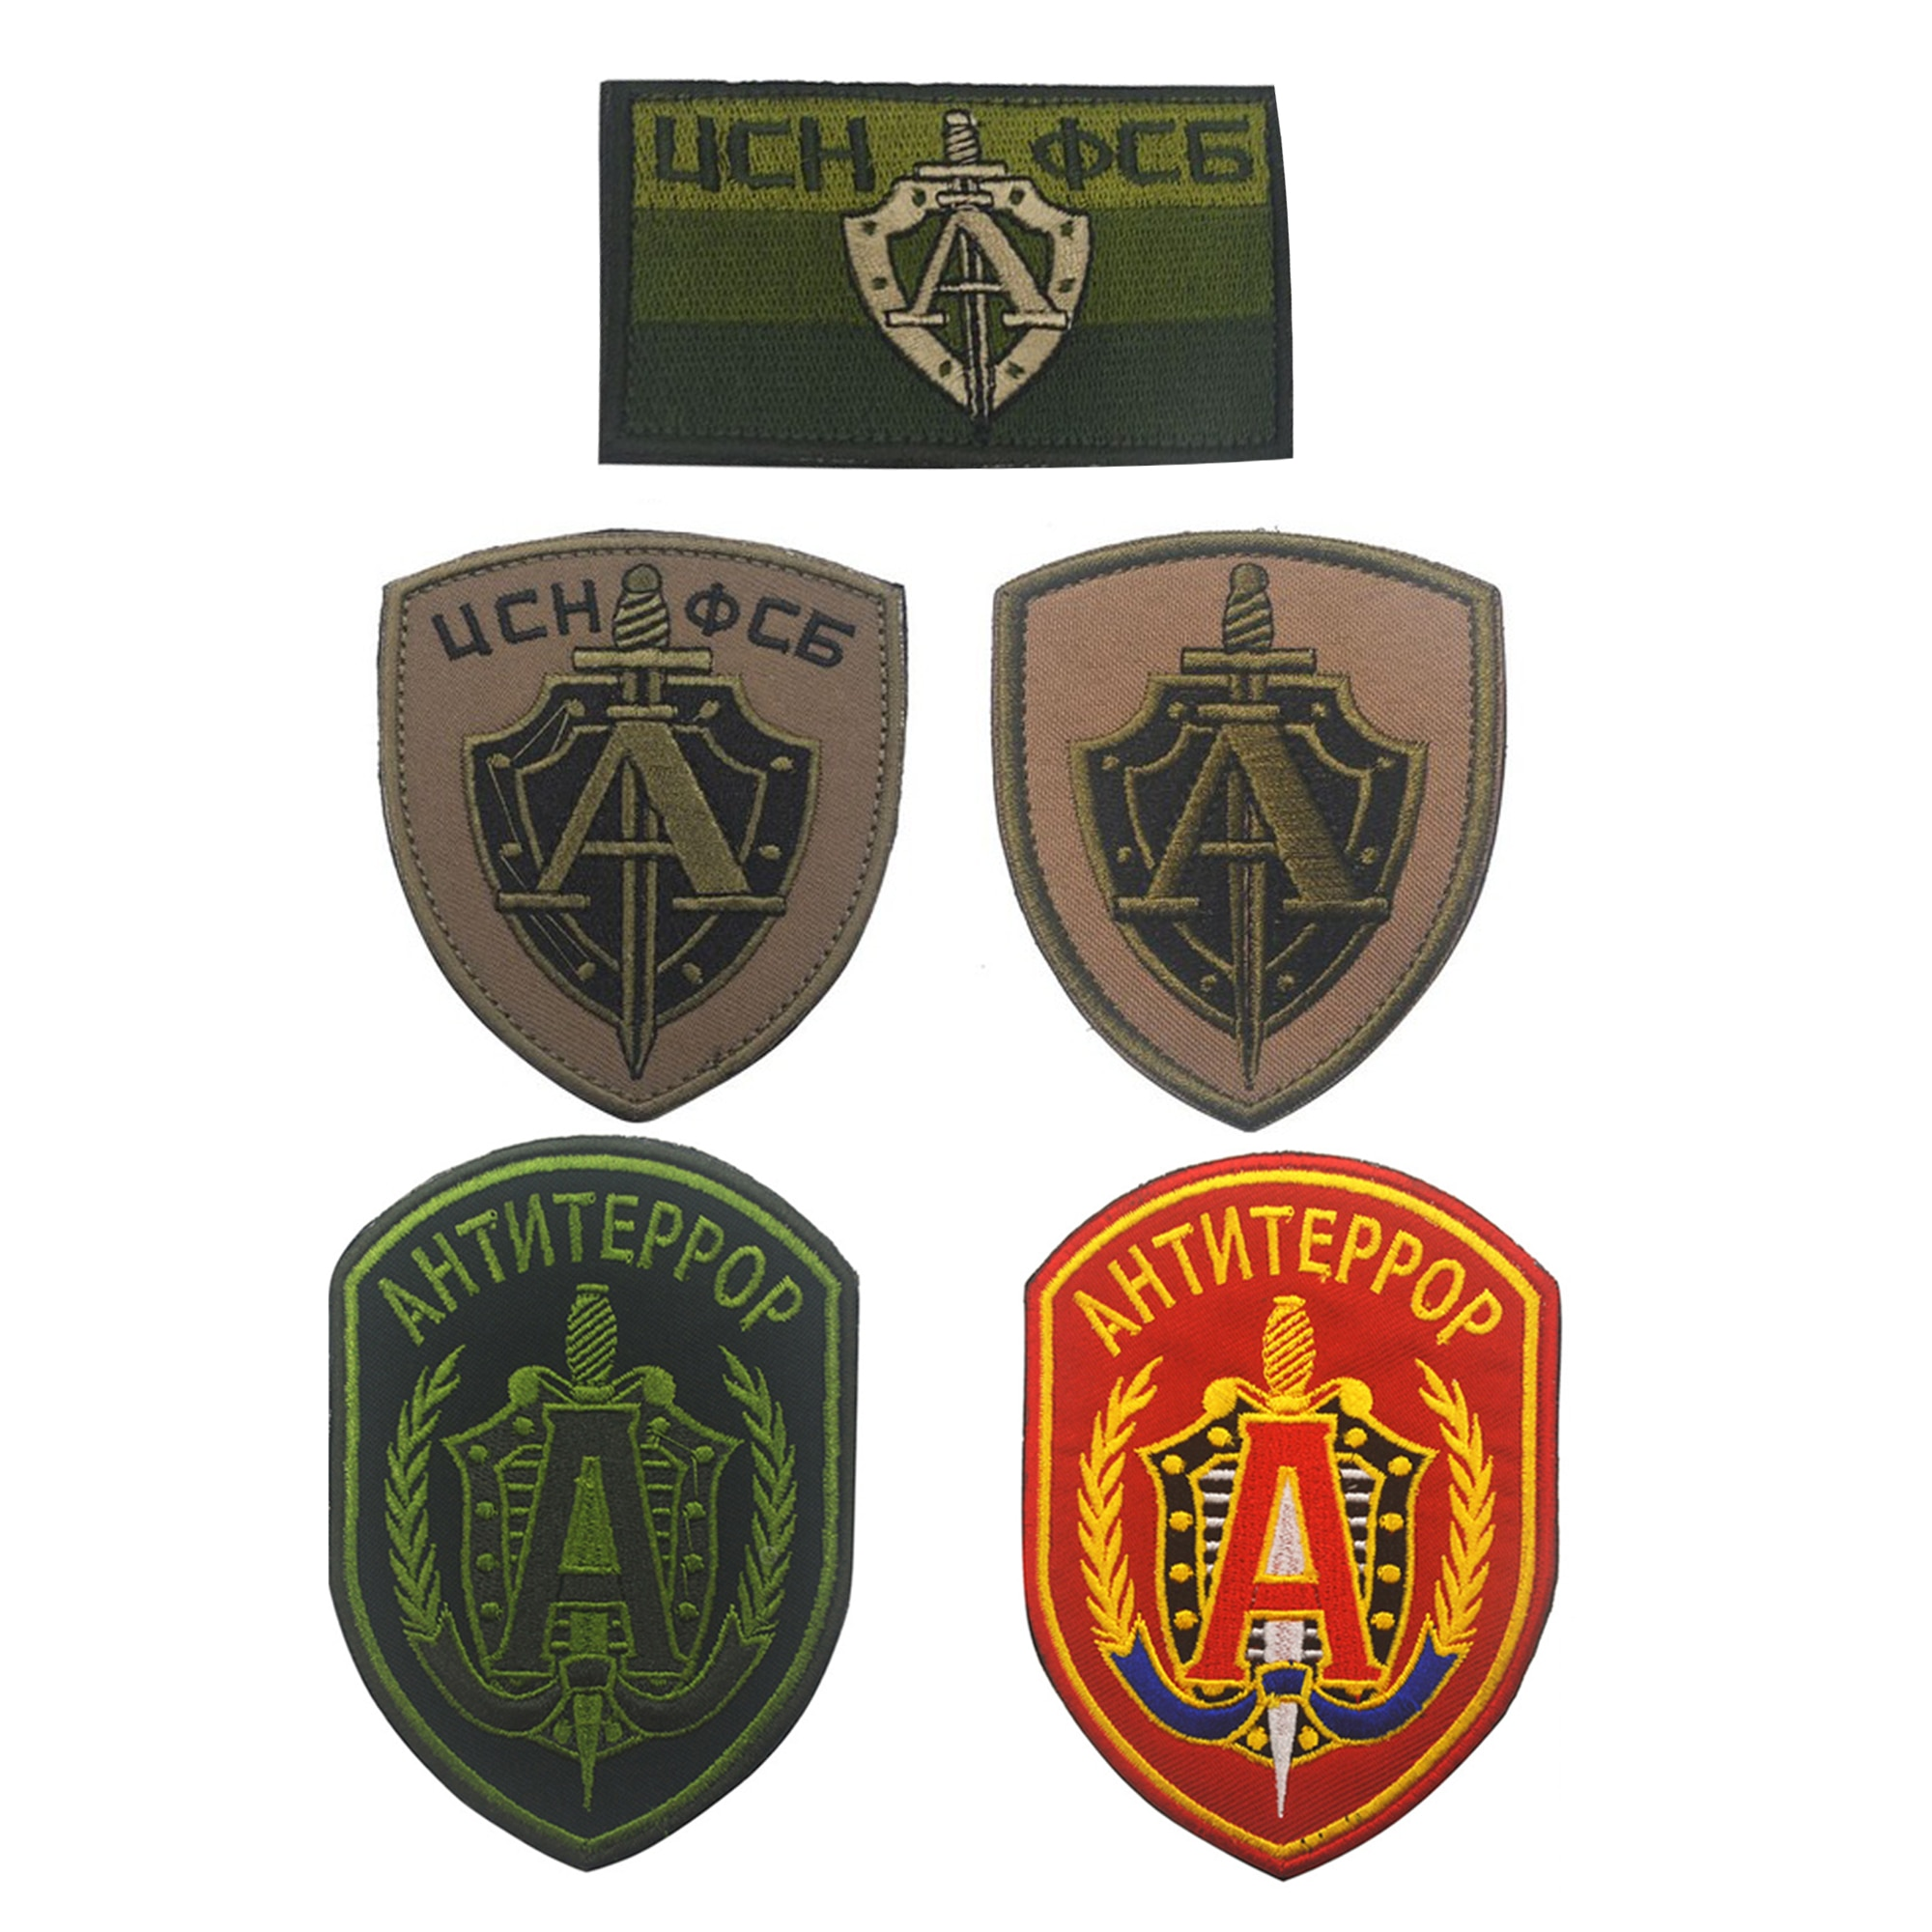 Insignia de parche de las fuerzas especiales rusas con manga militar SPETSNAZ ANTITERROR grupo A (ALPHA)